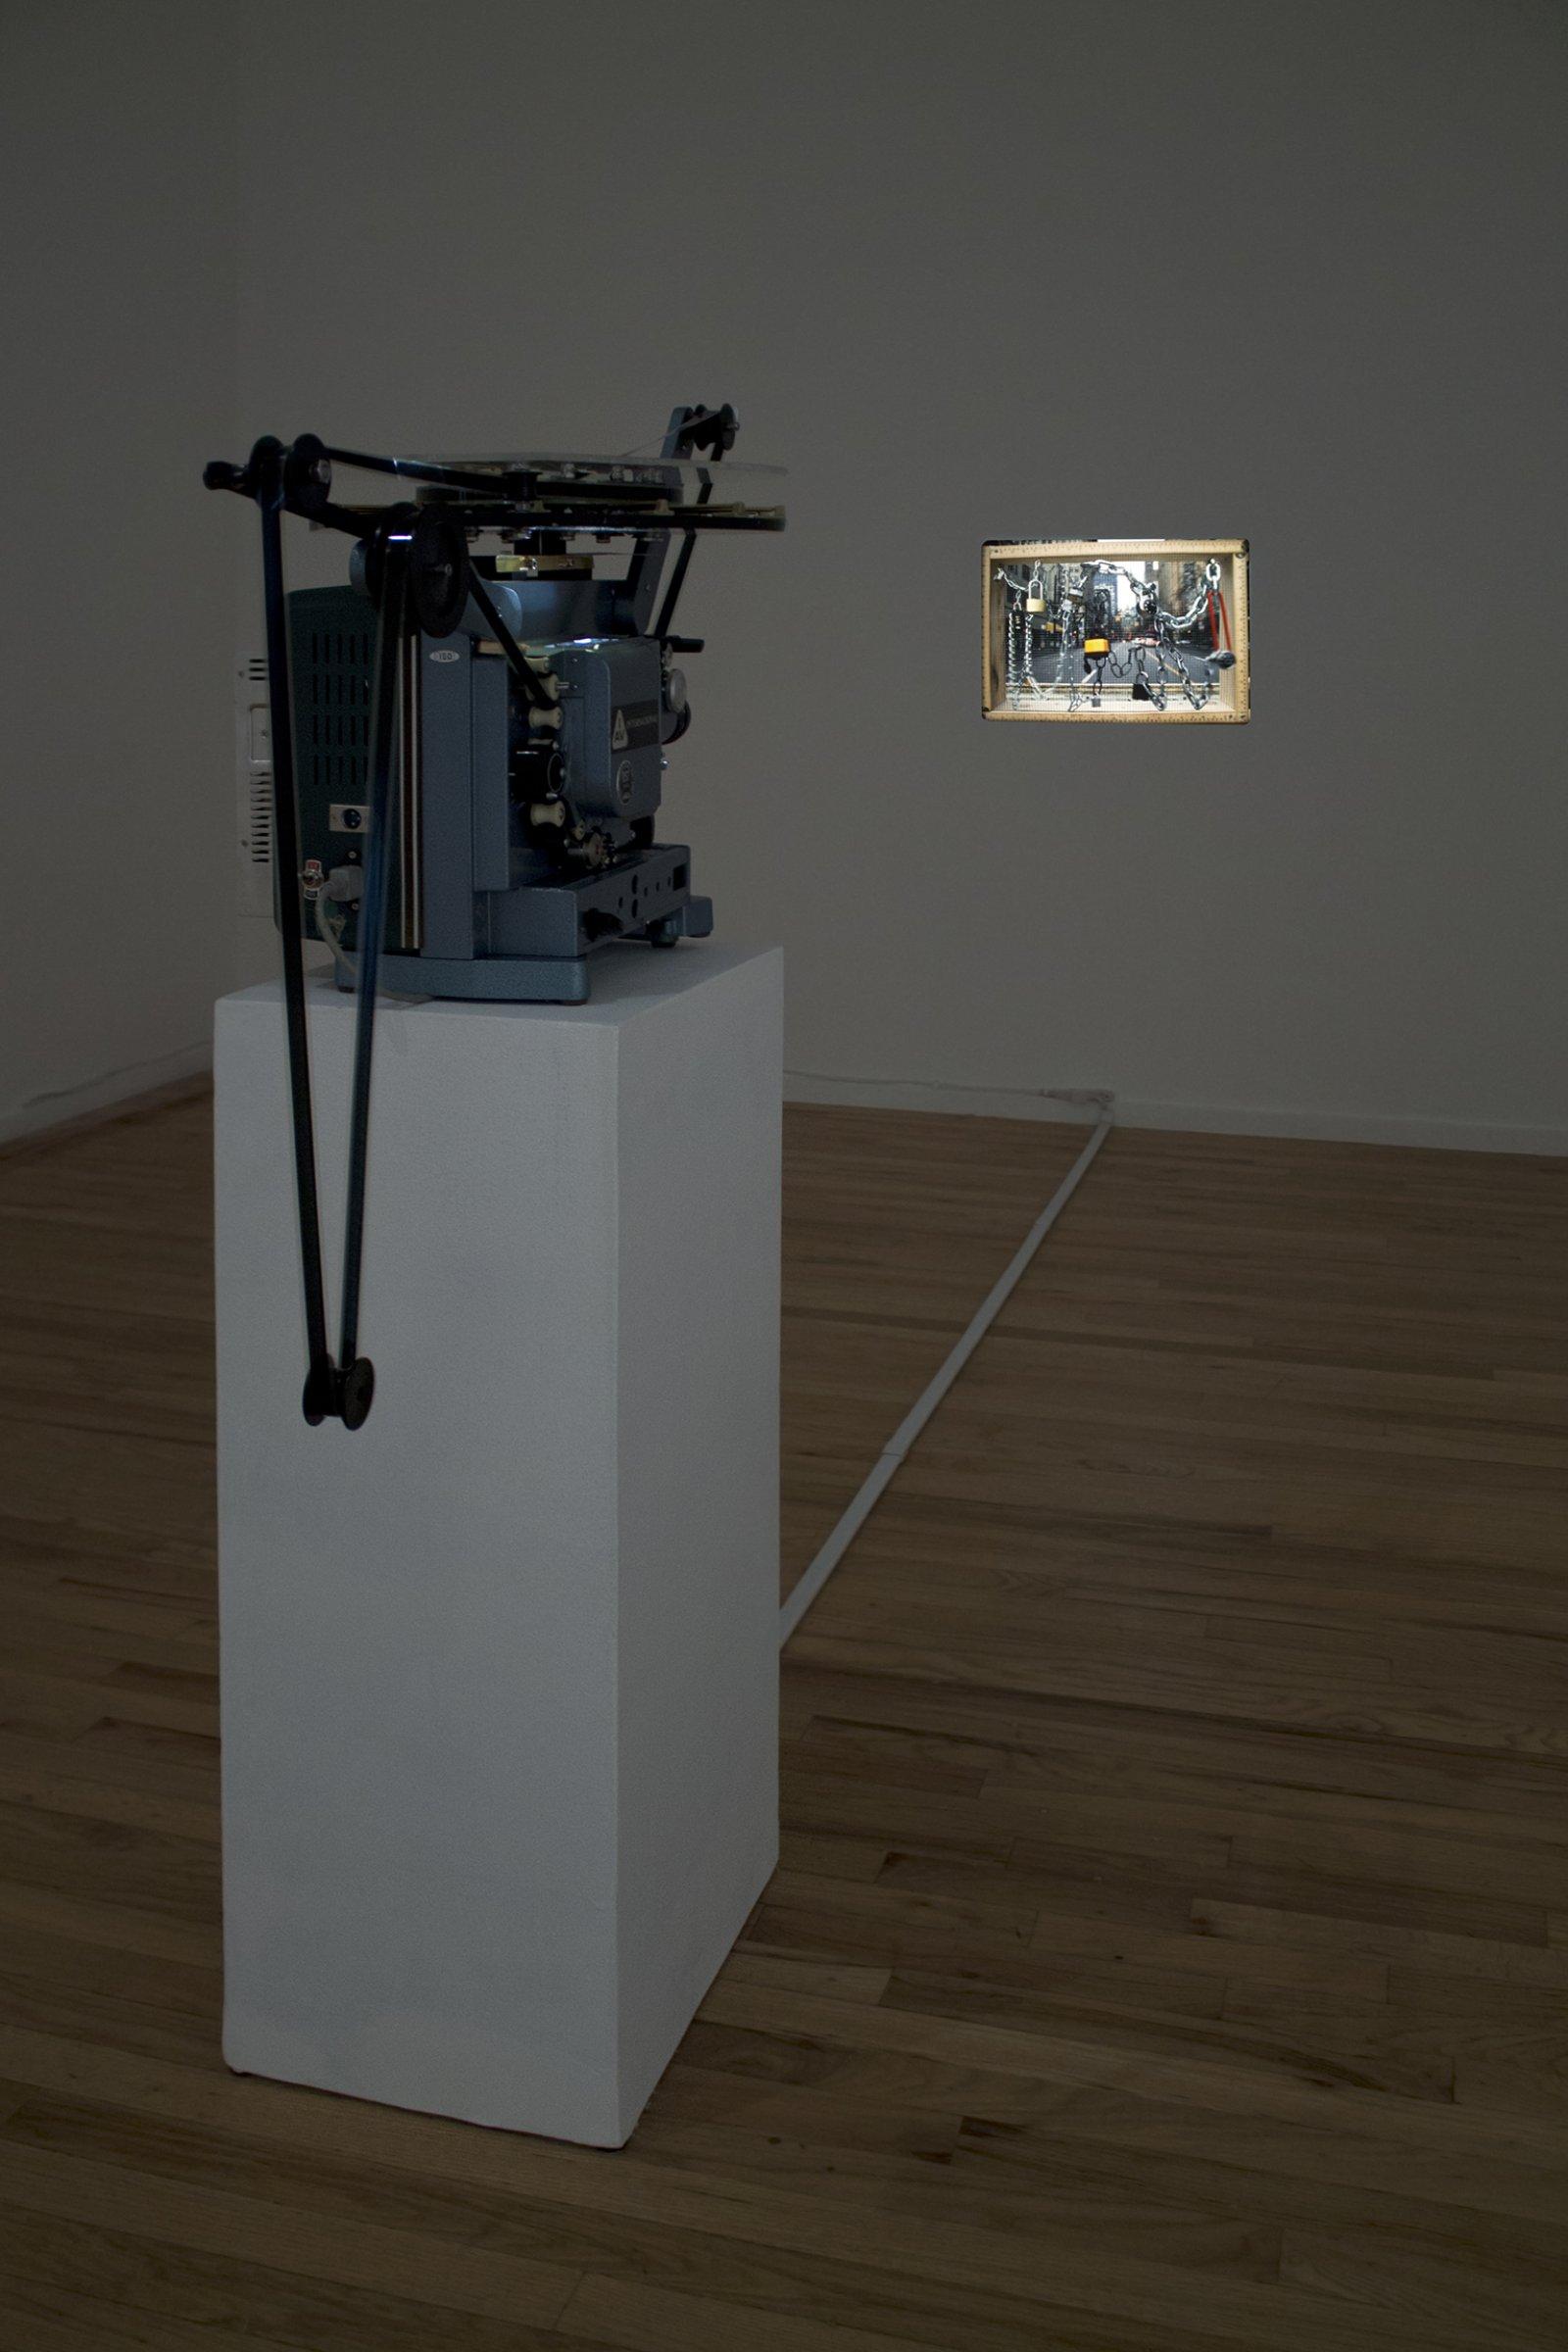 Julia Feyrer,Escape Scenes, 2014, 16mm film, silent, 4 minutes, 37 seconds, dimensions variable